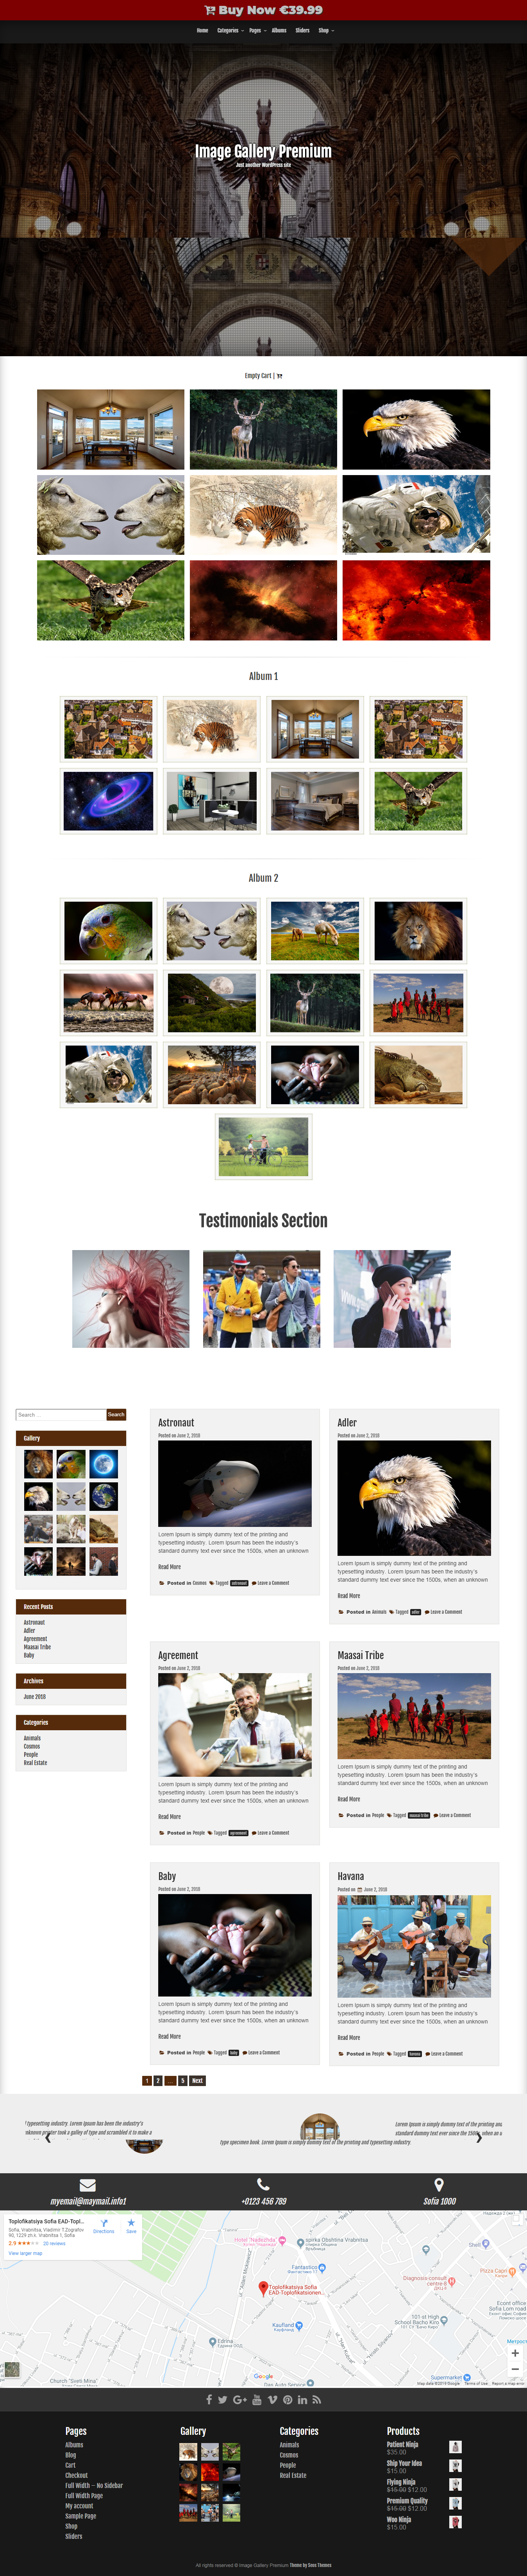 Image Gallery - Best Free Gallery WordPress Theme